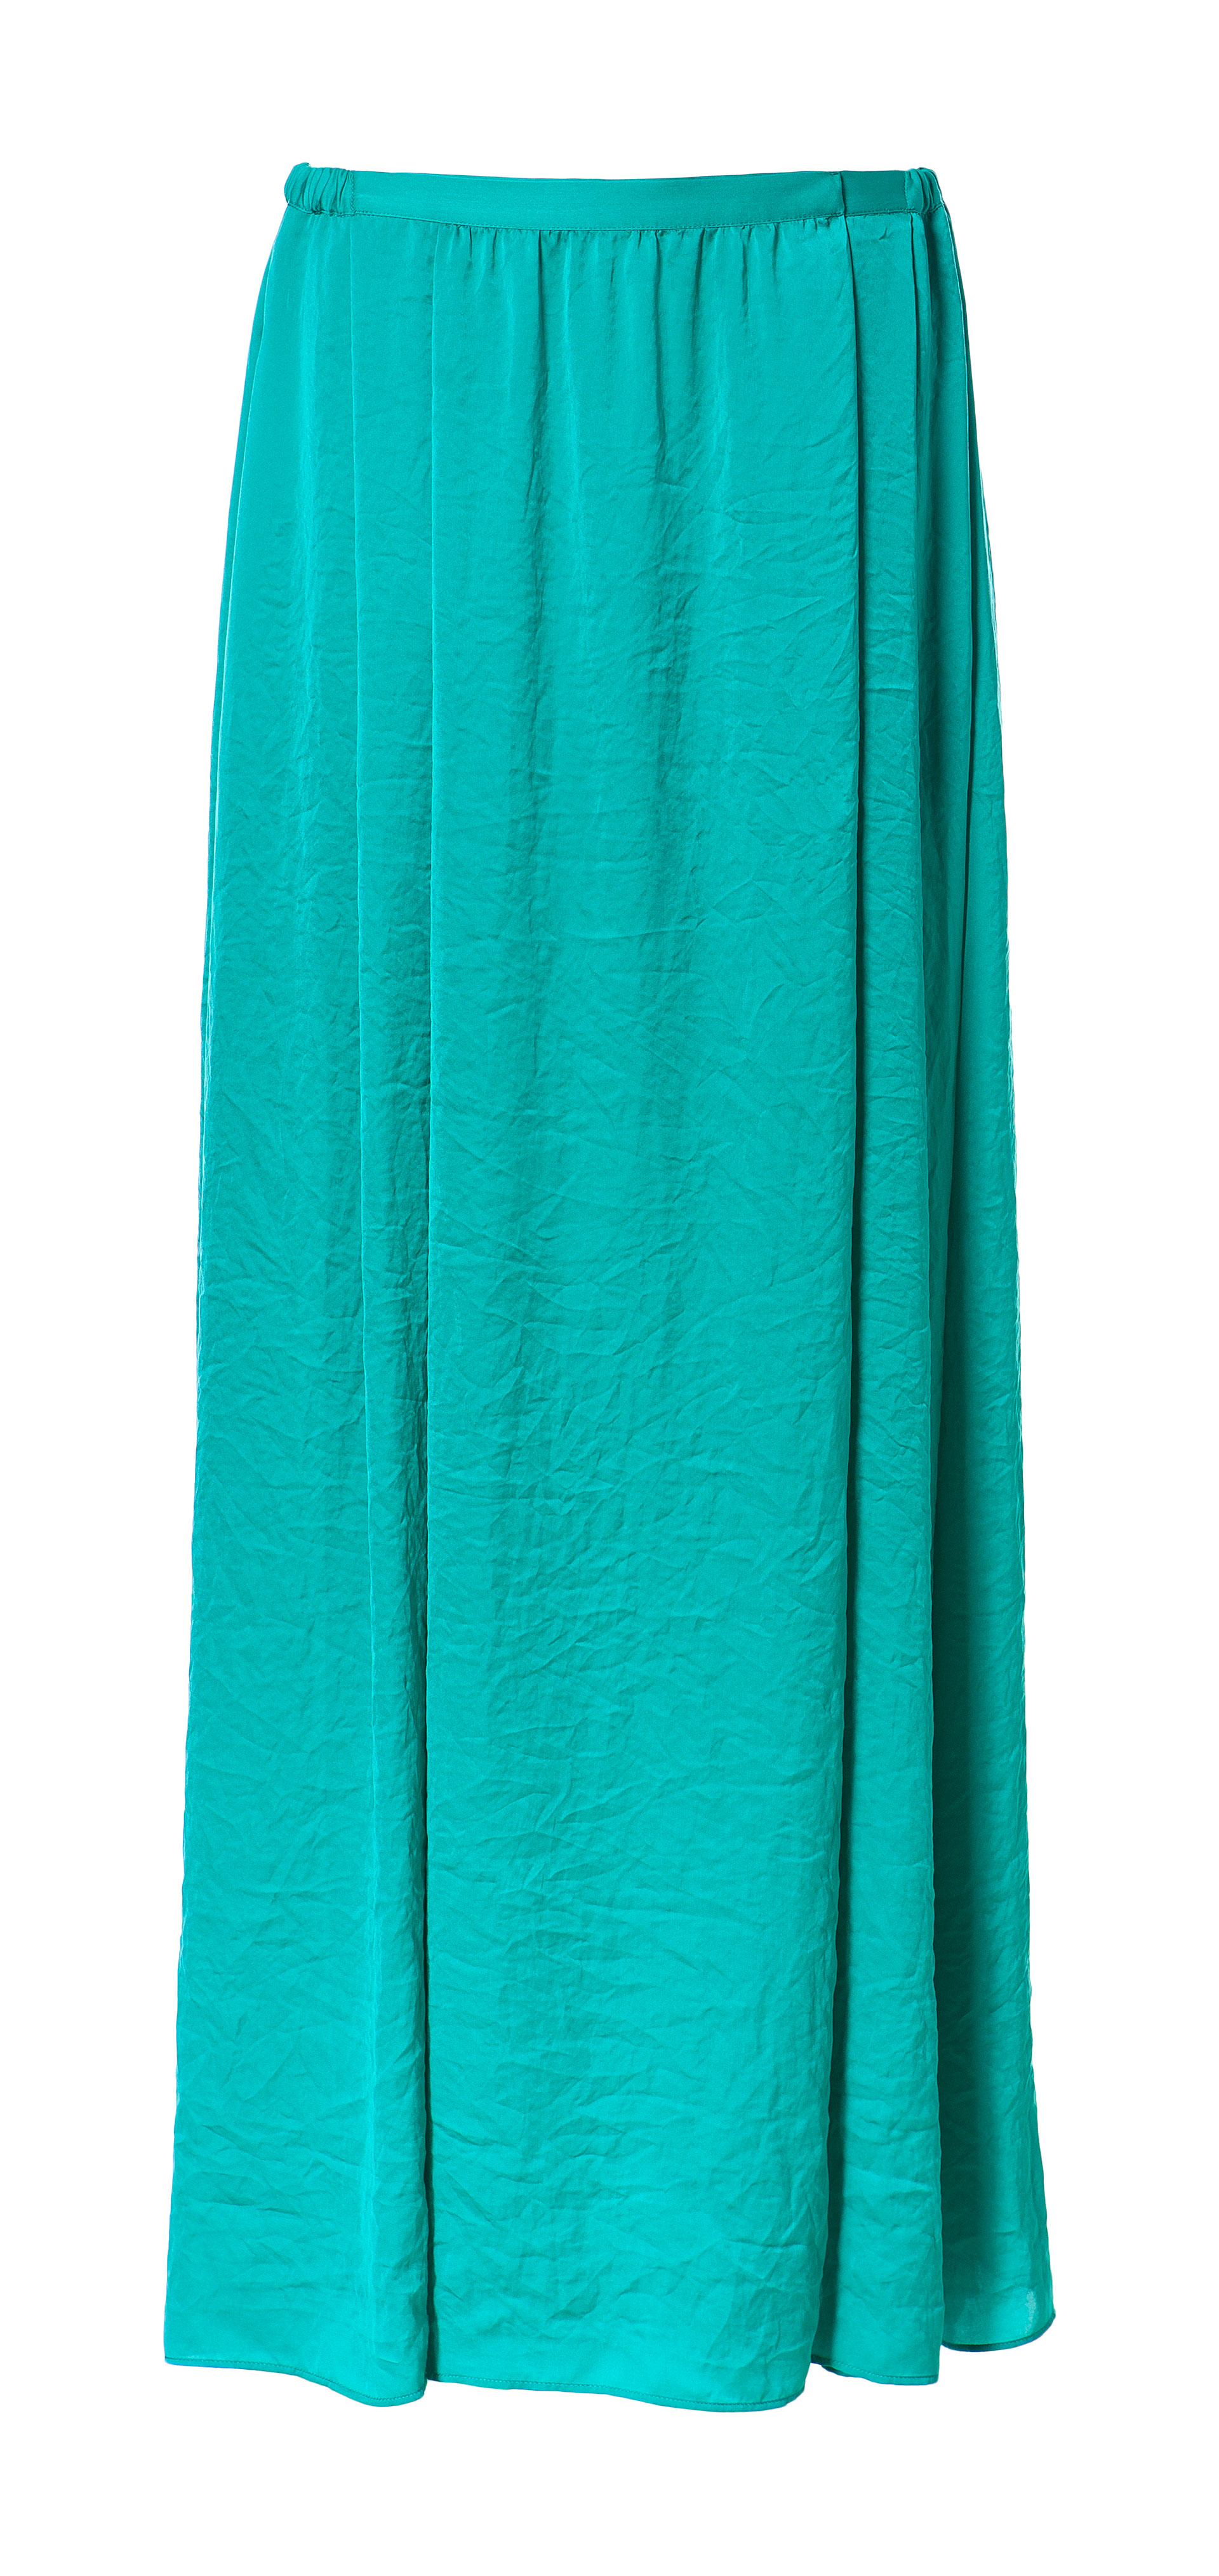 zara silk satin skirt in blue turquoise lyst